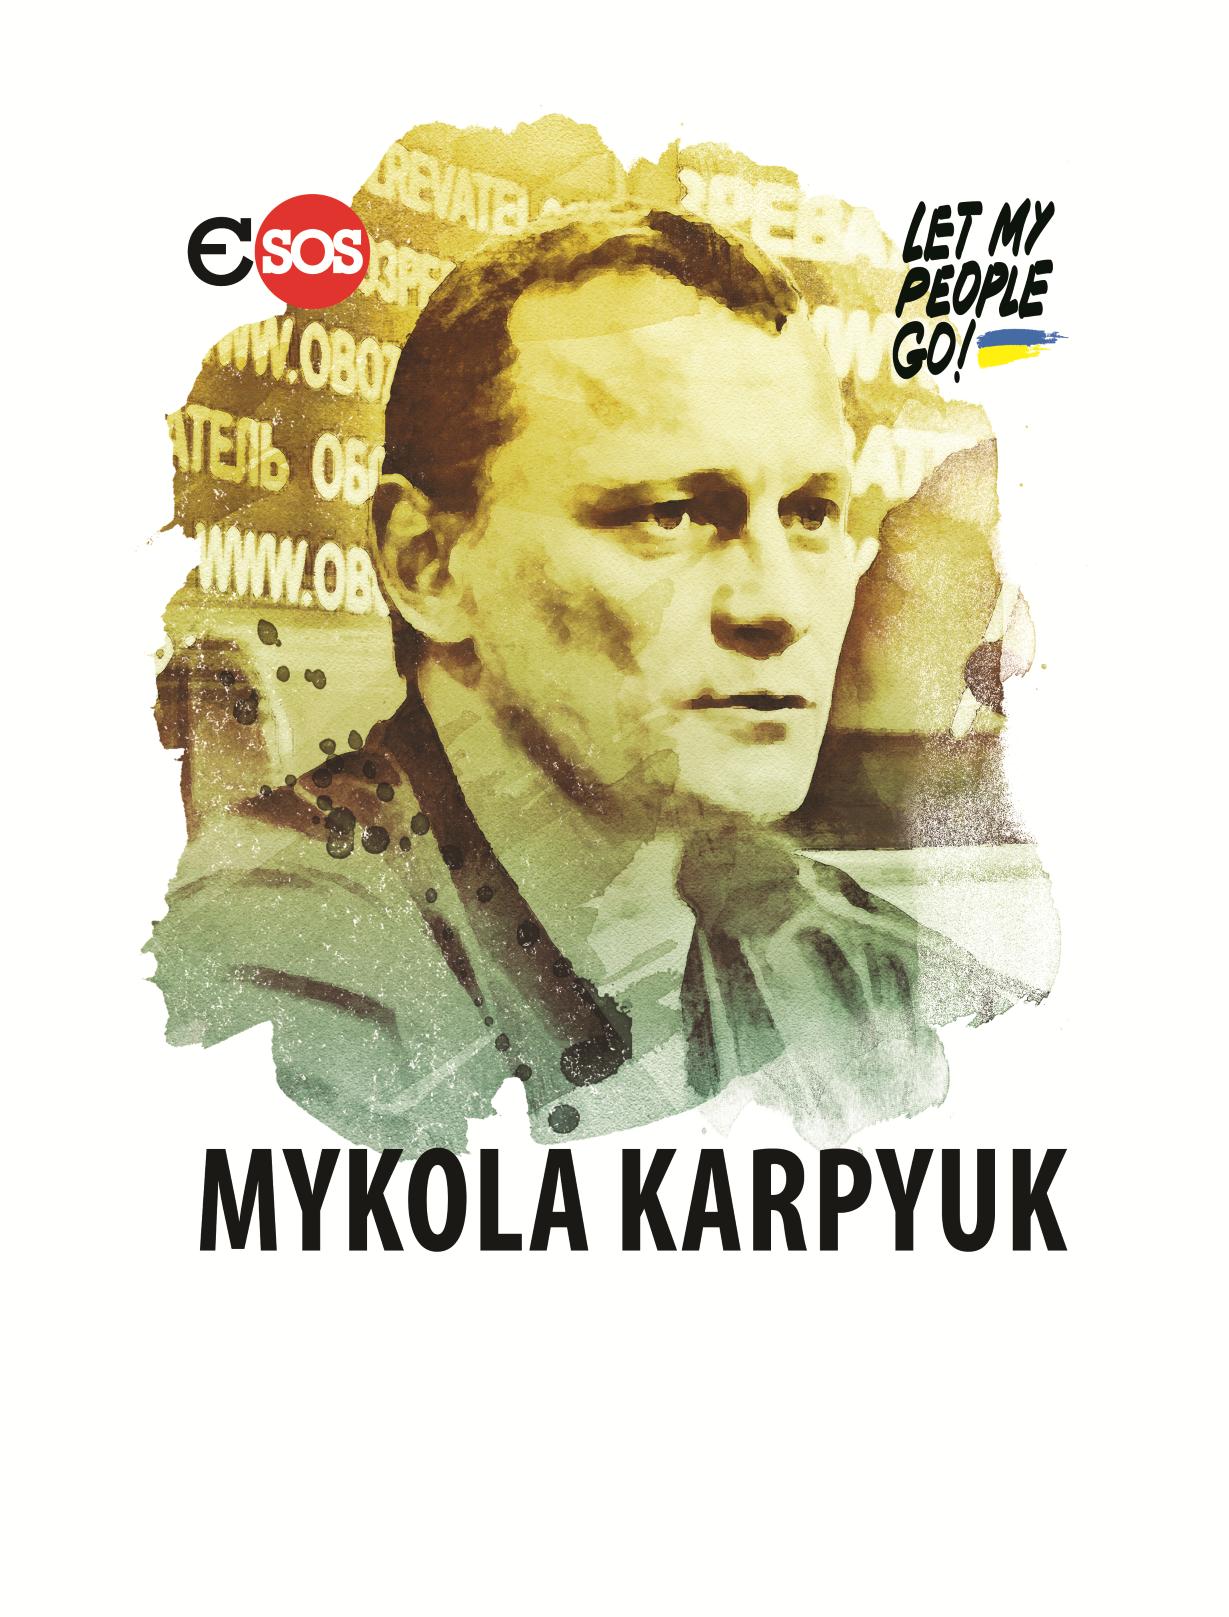 Karpiouk